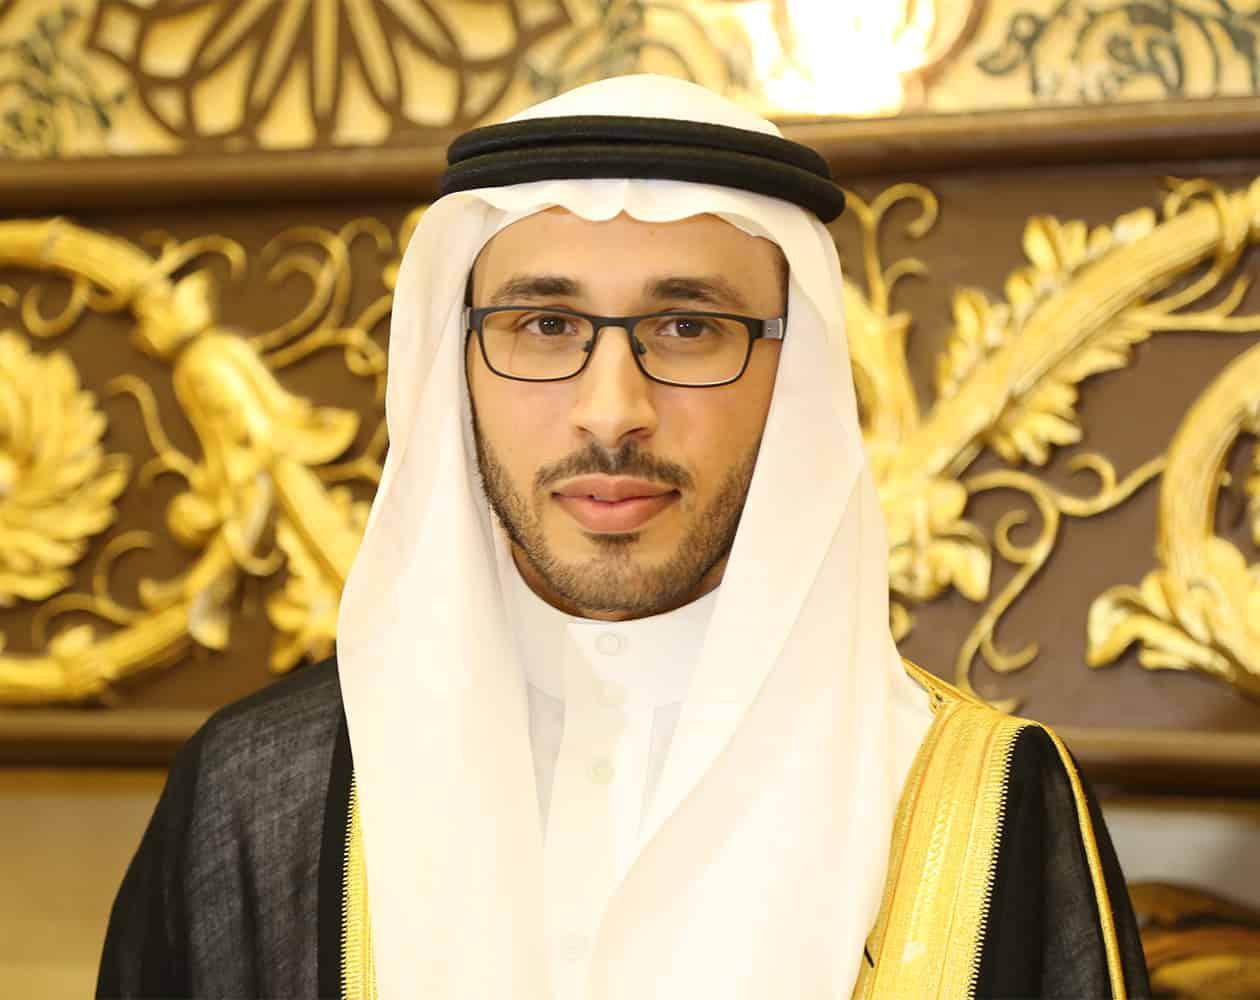 Ahmad AlMaiman, Chief Information Officer